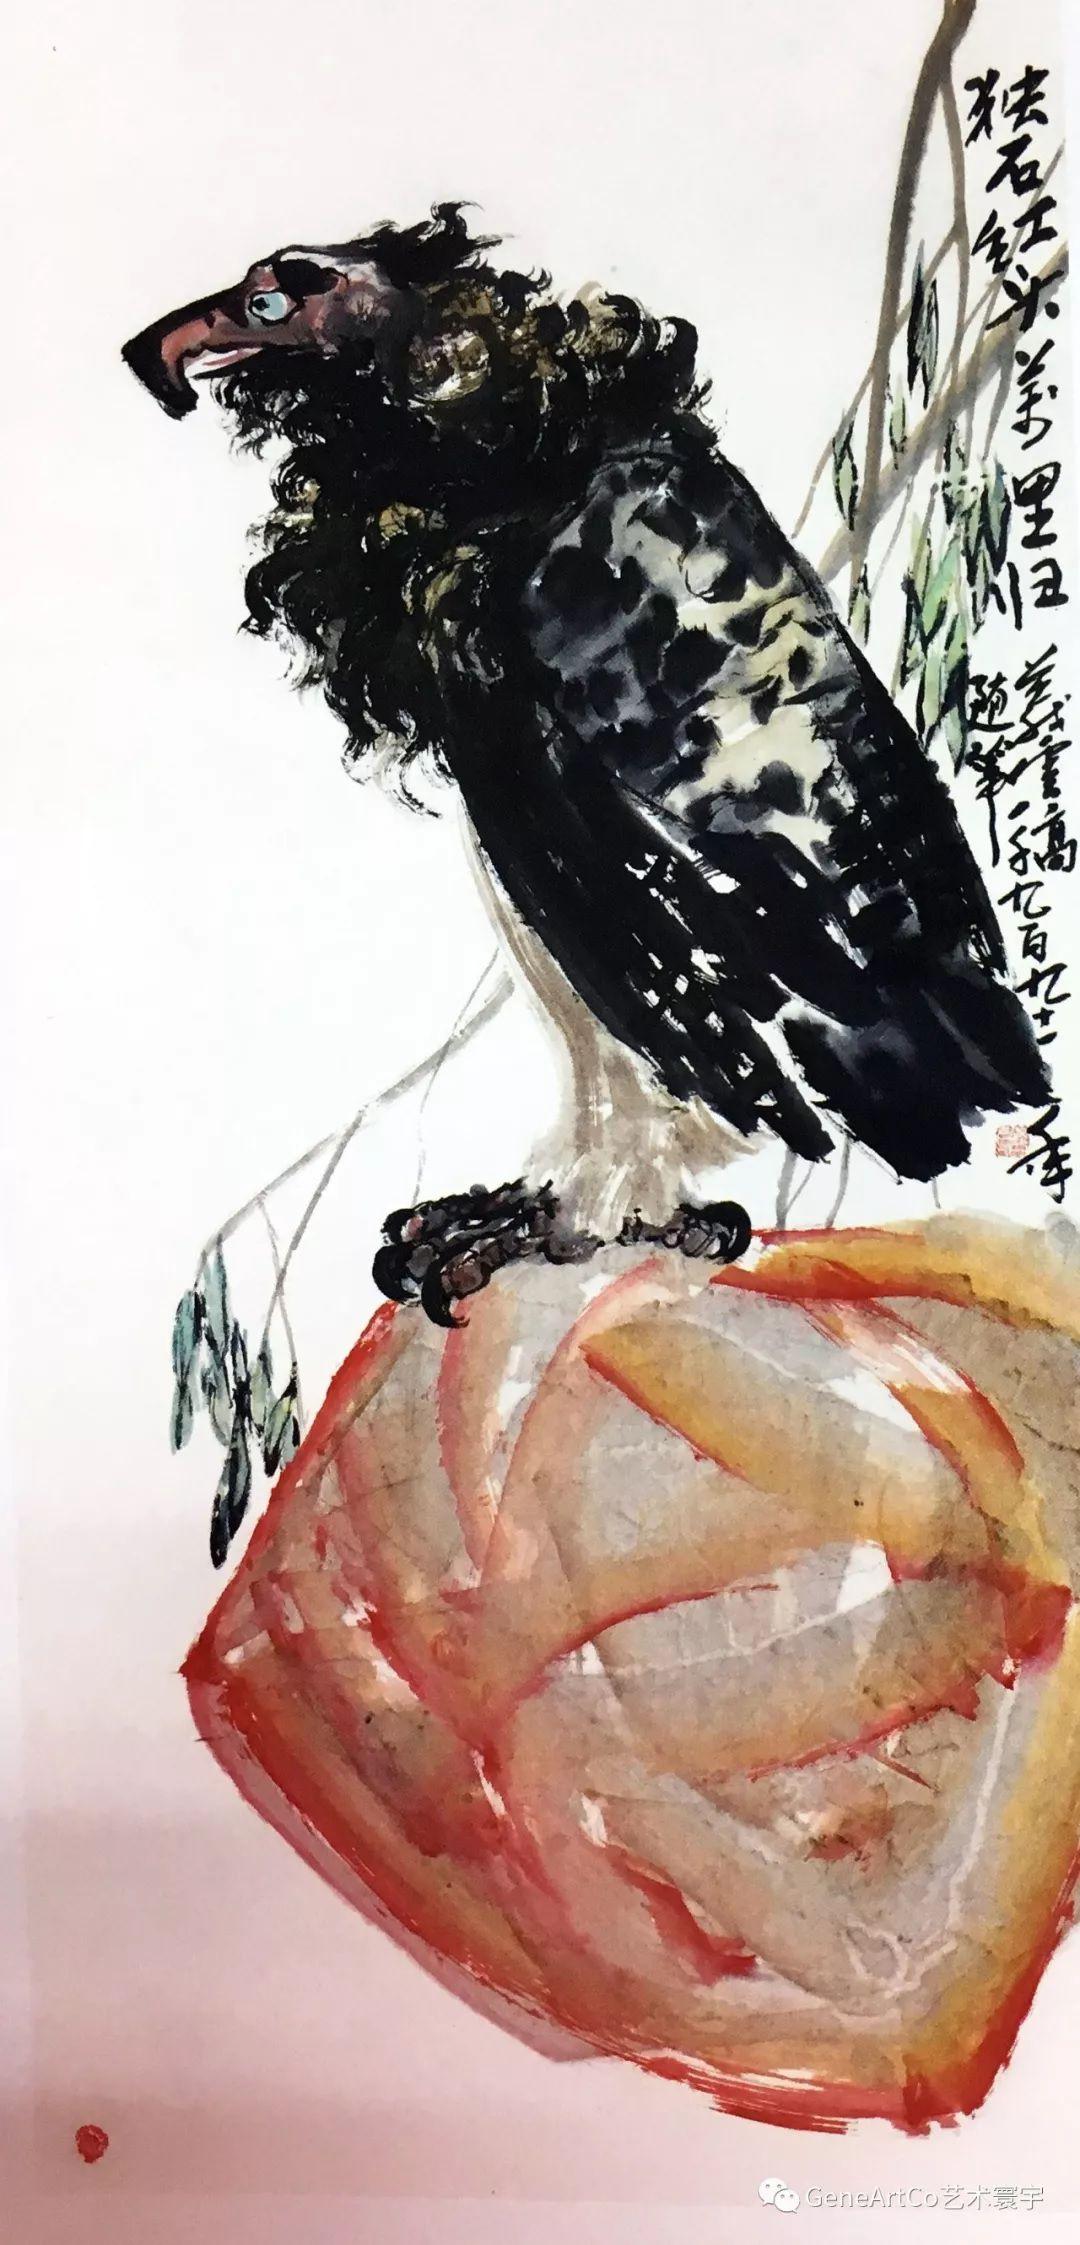 H.H.第三世多杰羌佛中國畫作品:獨石紅頭萬里歸